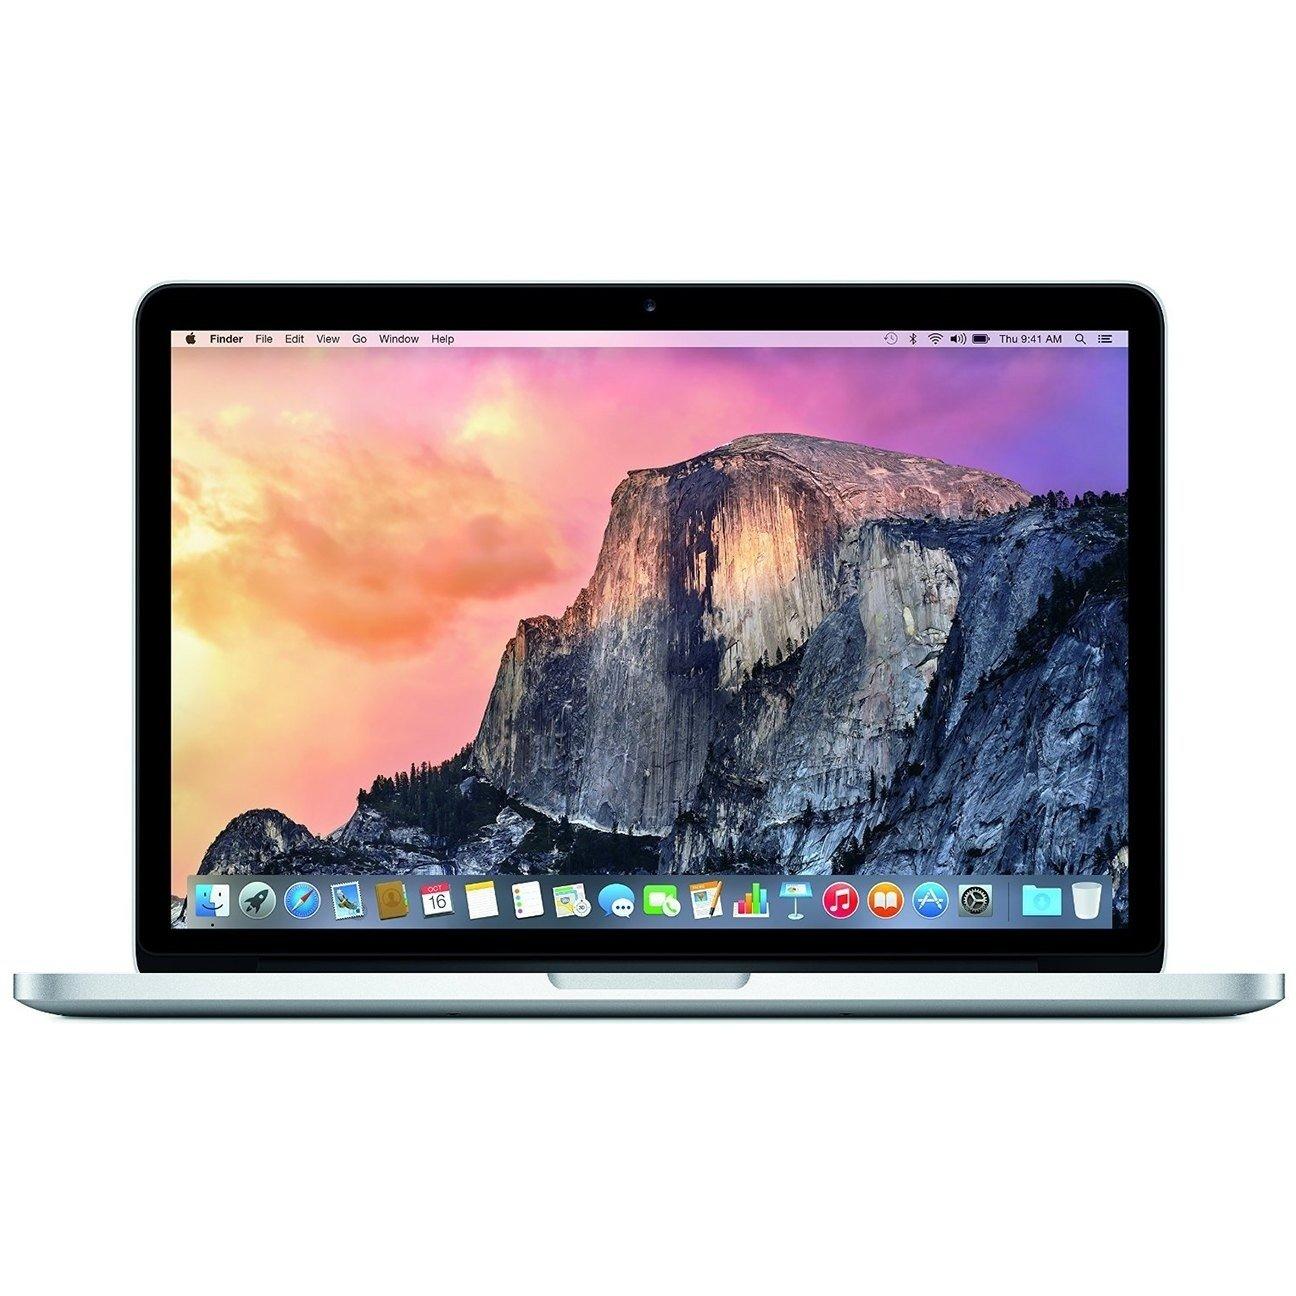 Apple MD313LL/A Macbook Pro 13.3-inch Dual Core i5 8GB RAM 500GB HDD Sierra – Certified Preloved